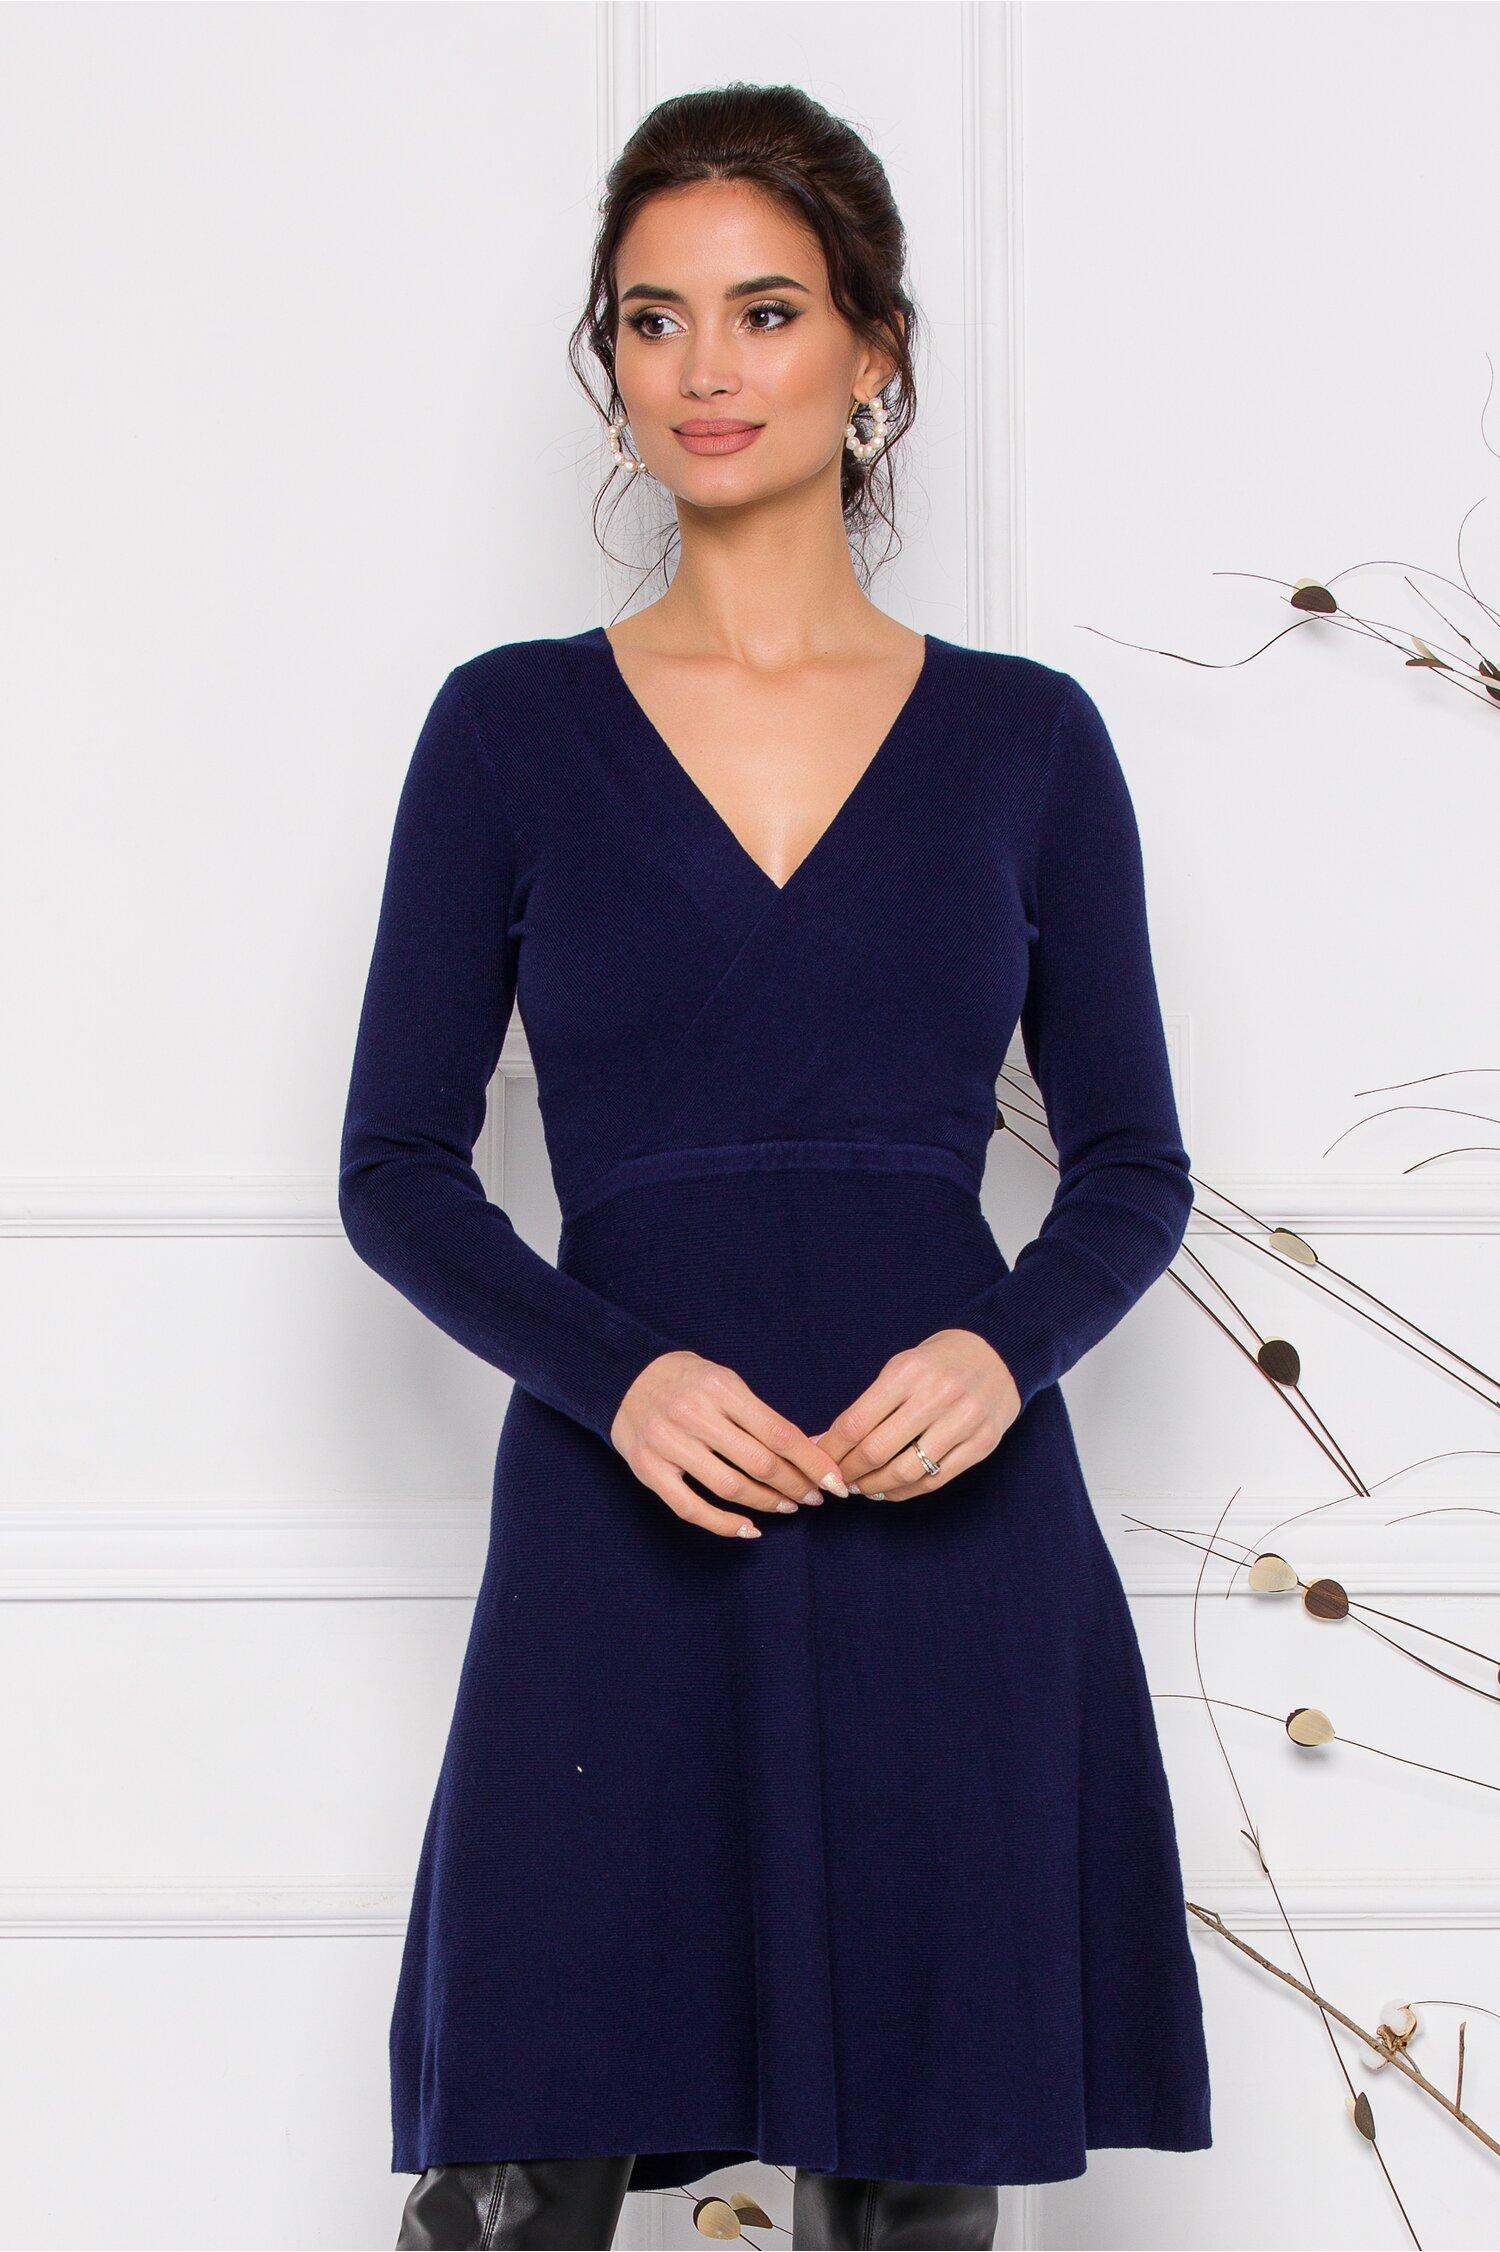 Rochie Pamy bleumarin din tricot cu decolteu petrecut imagine